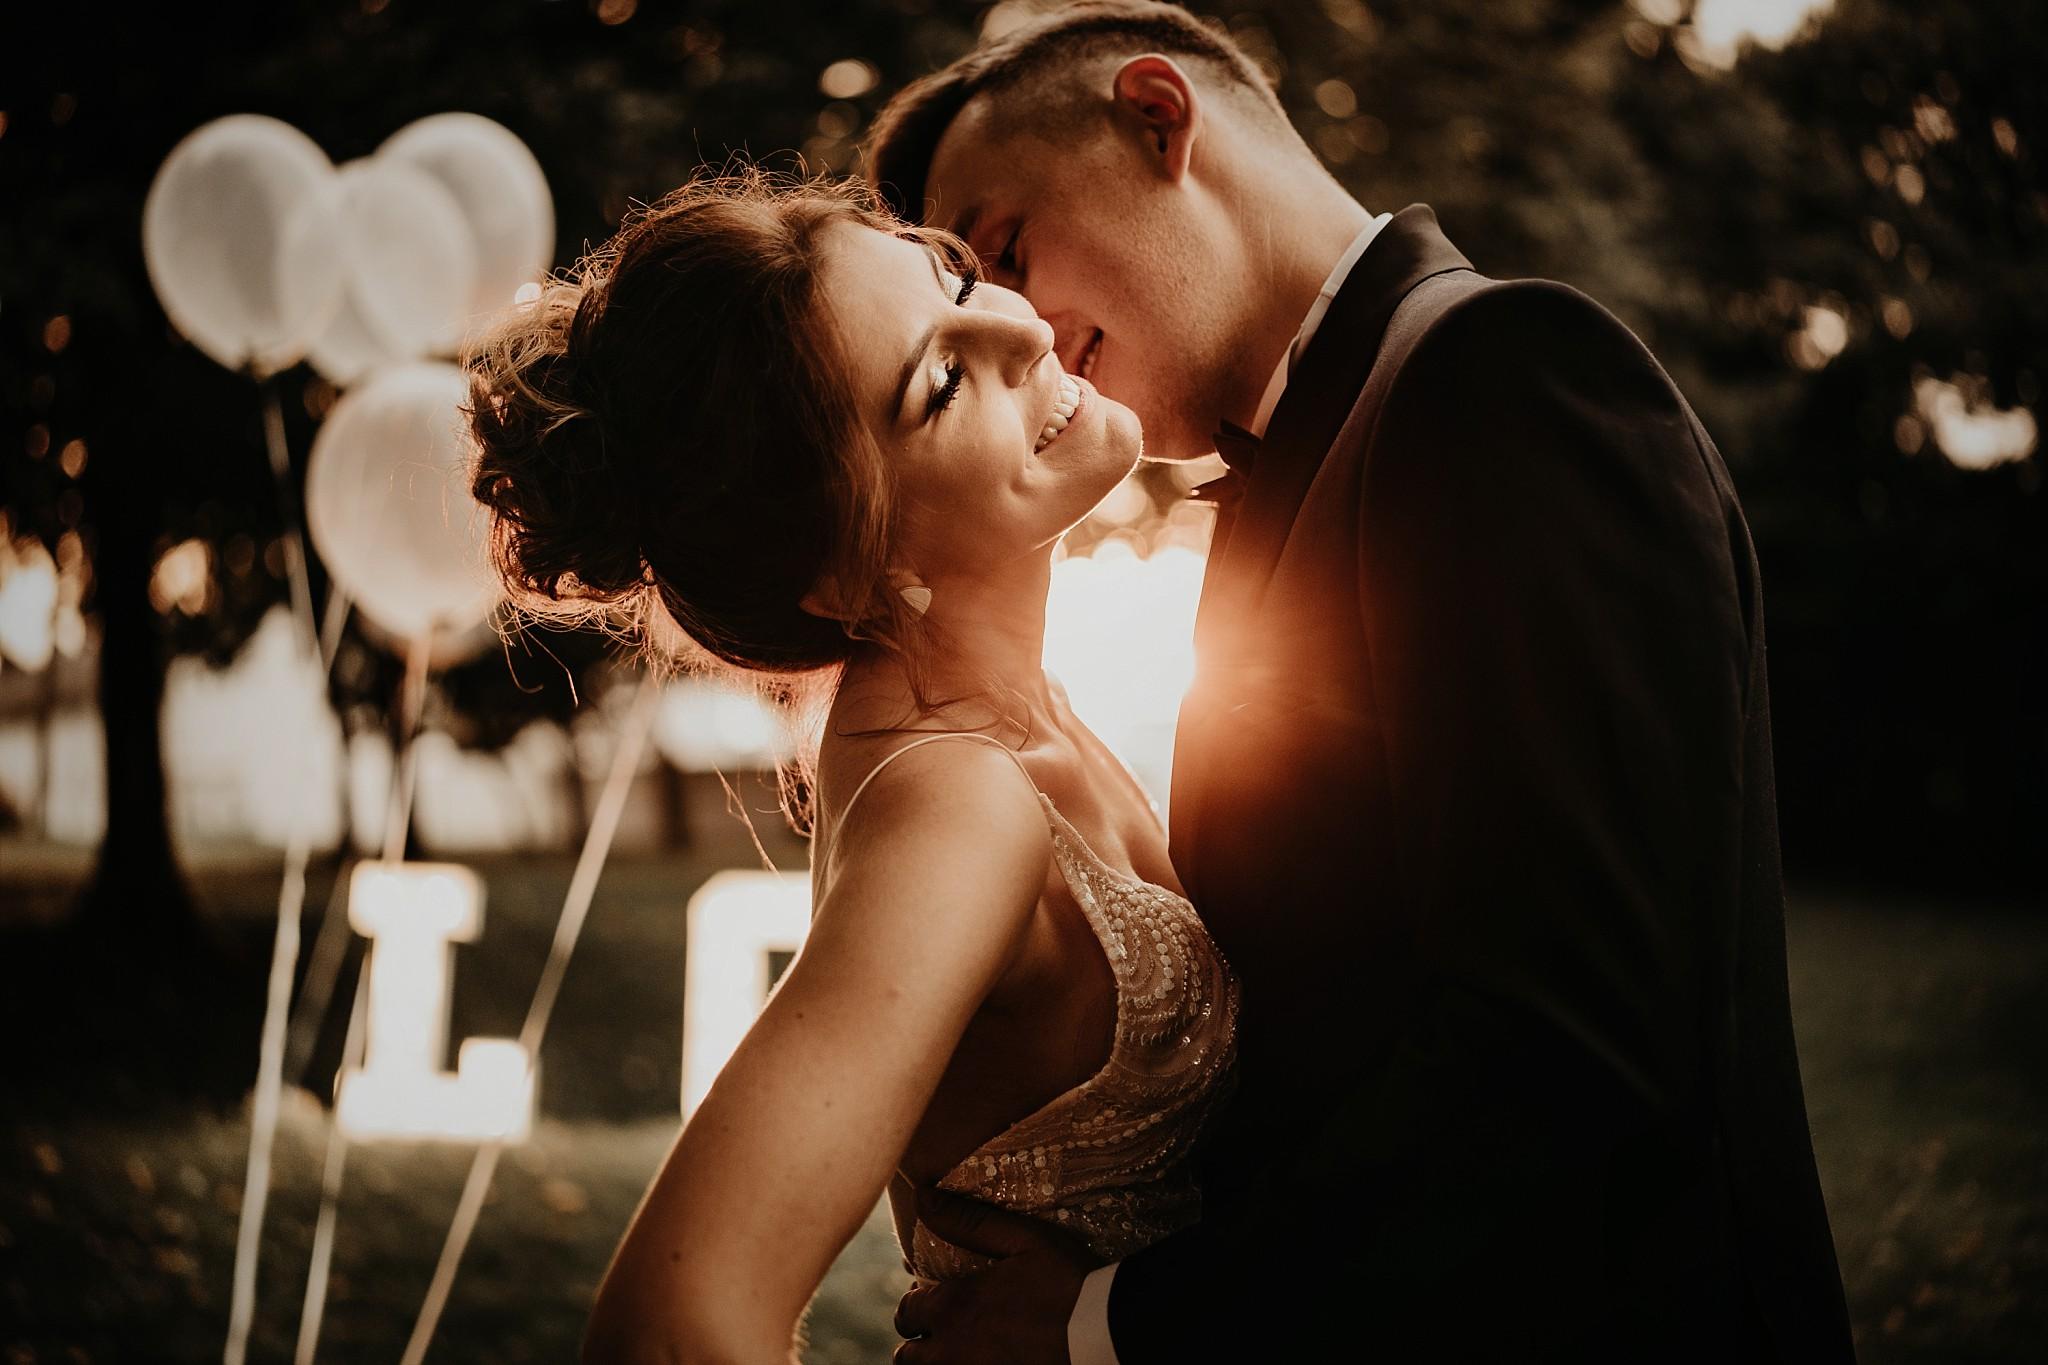 fotograf poznan wesele dobra truskawka piekne wesele pod poznaniem wesele w dobrej truskawce piekna para mloda slub marzen slub koronawirus slub listopad wesele koronawirus 374